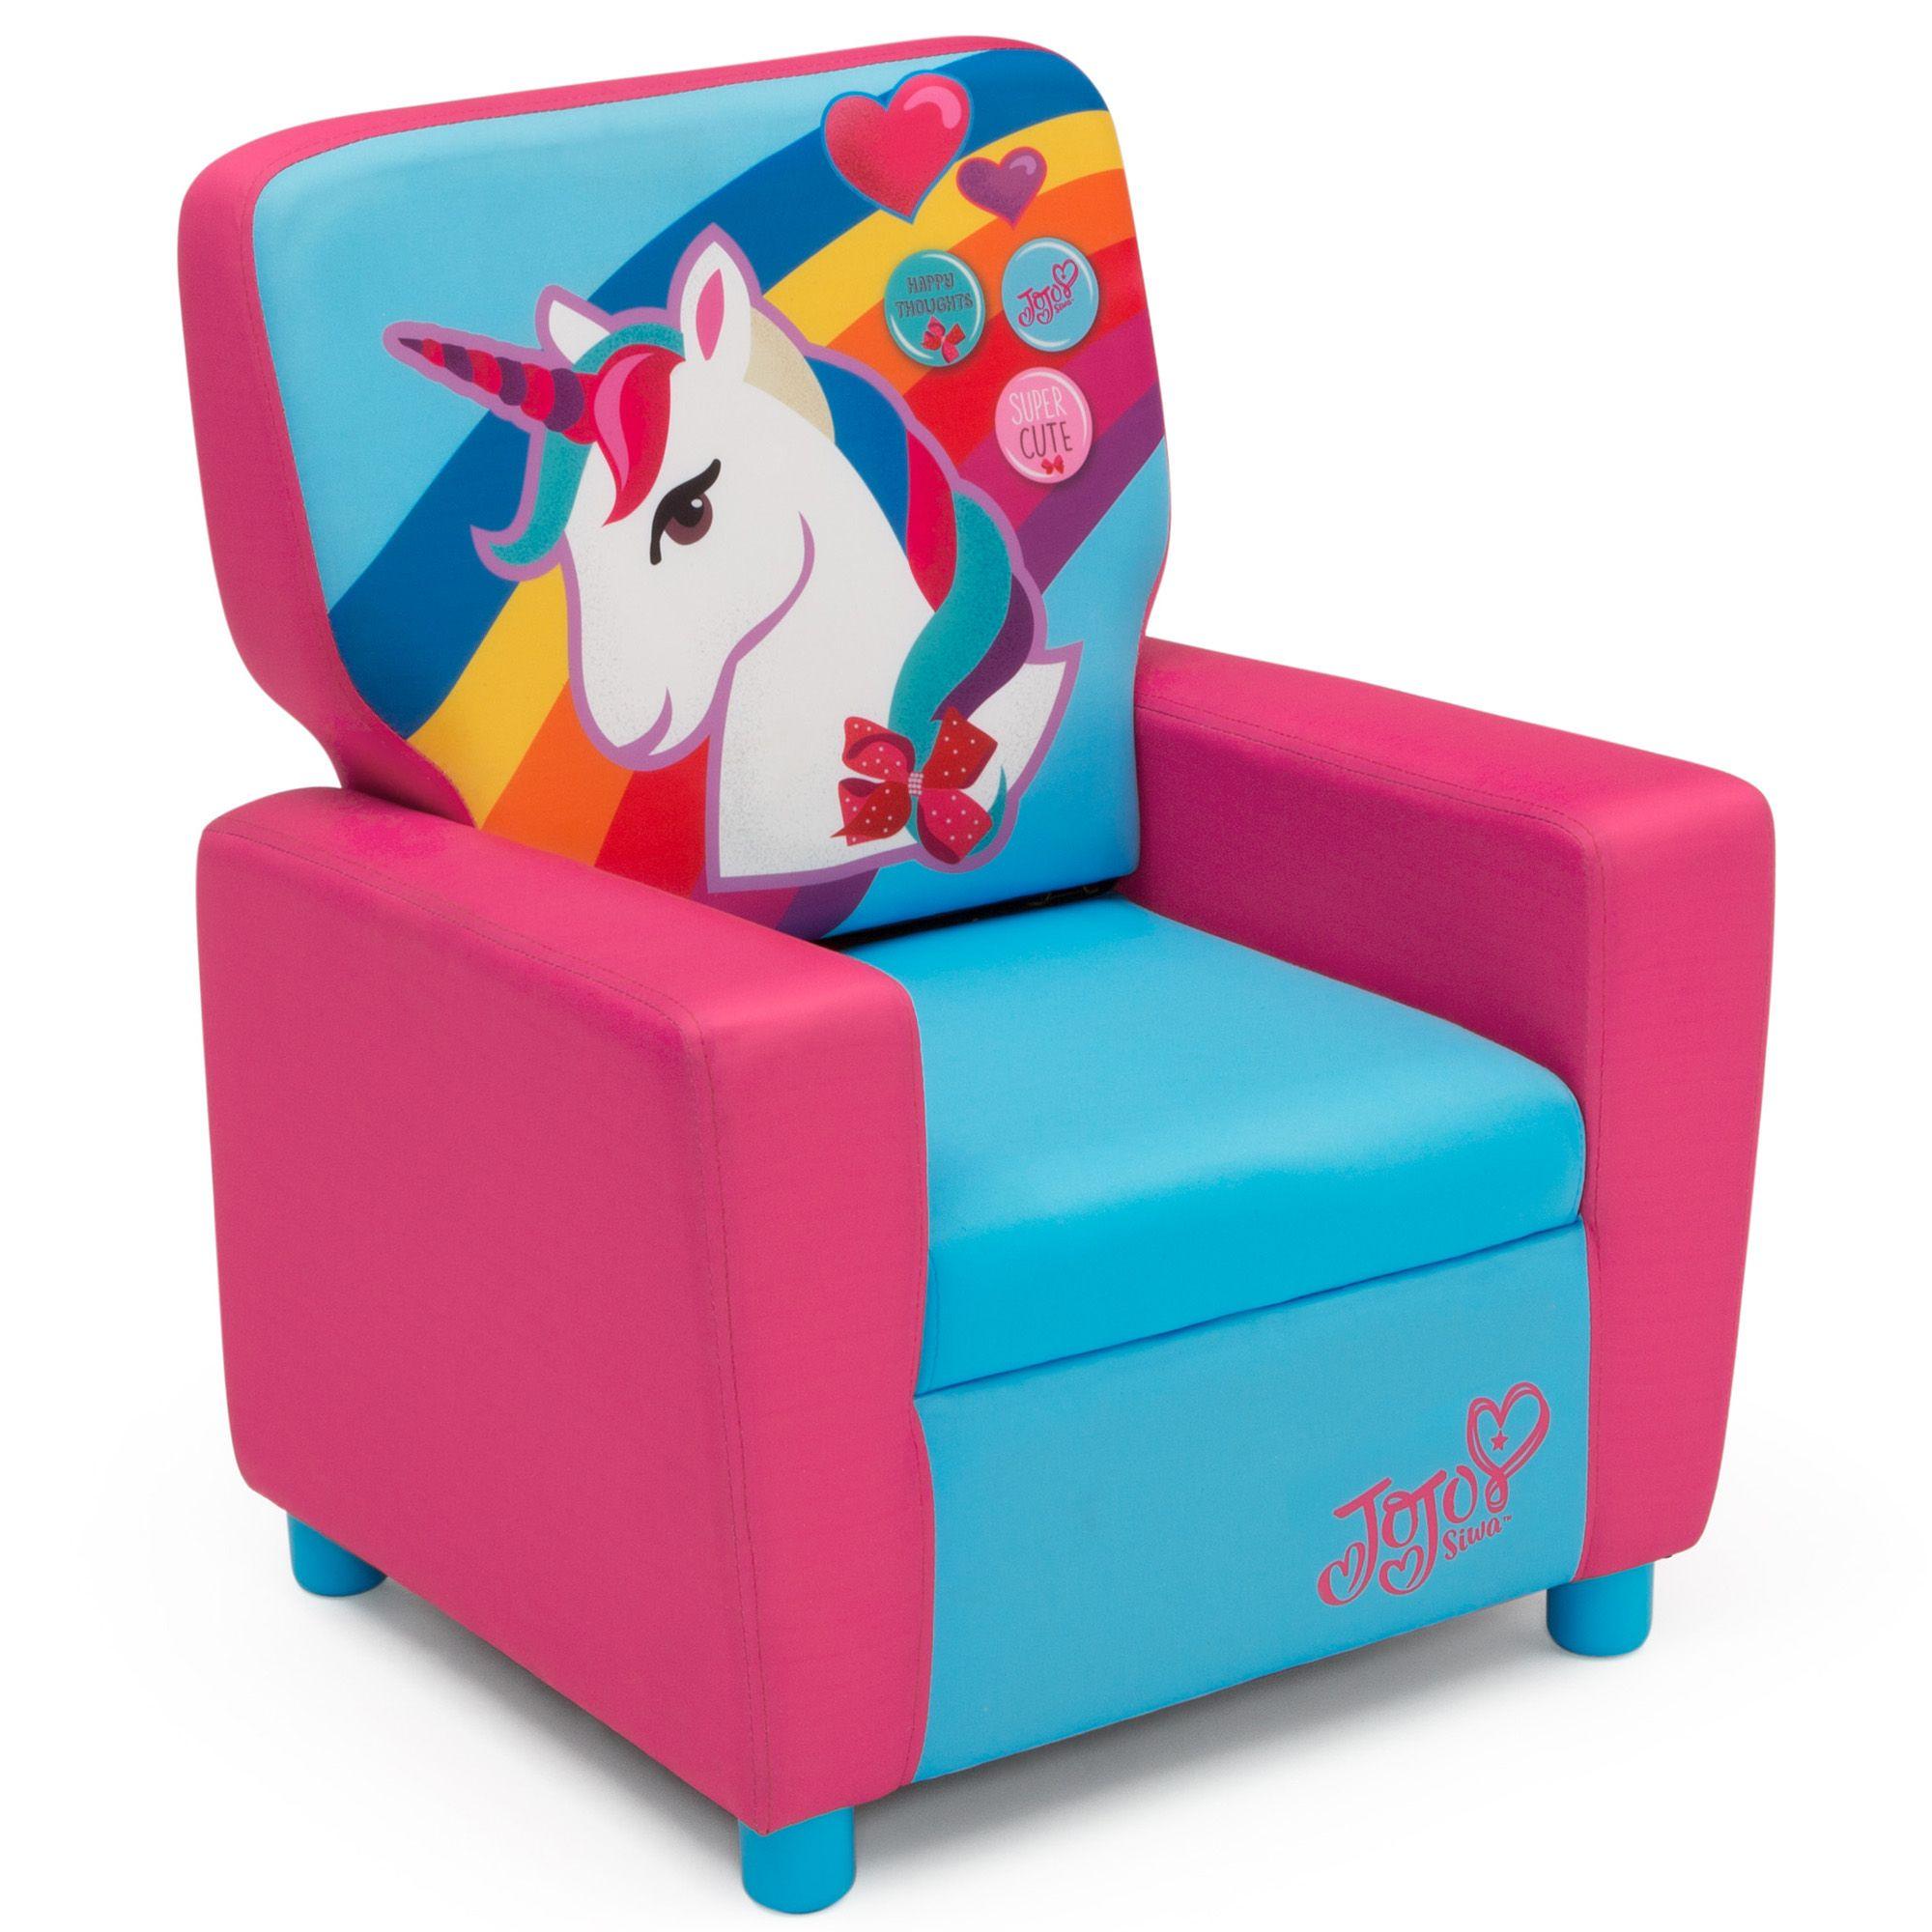 Baby Kids Sofa Upholstered Chairs Delta Children